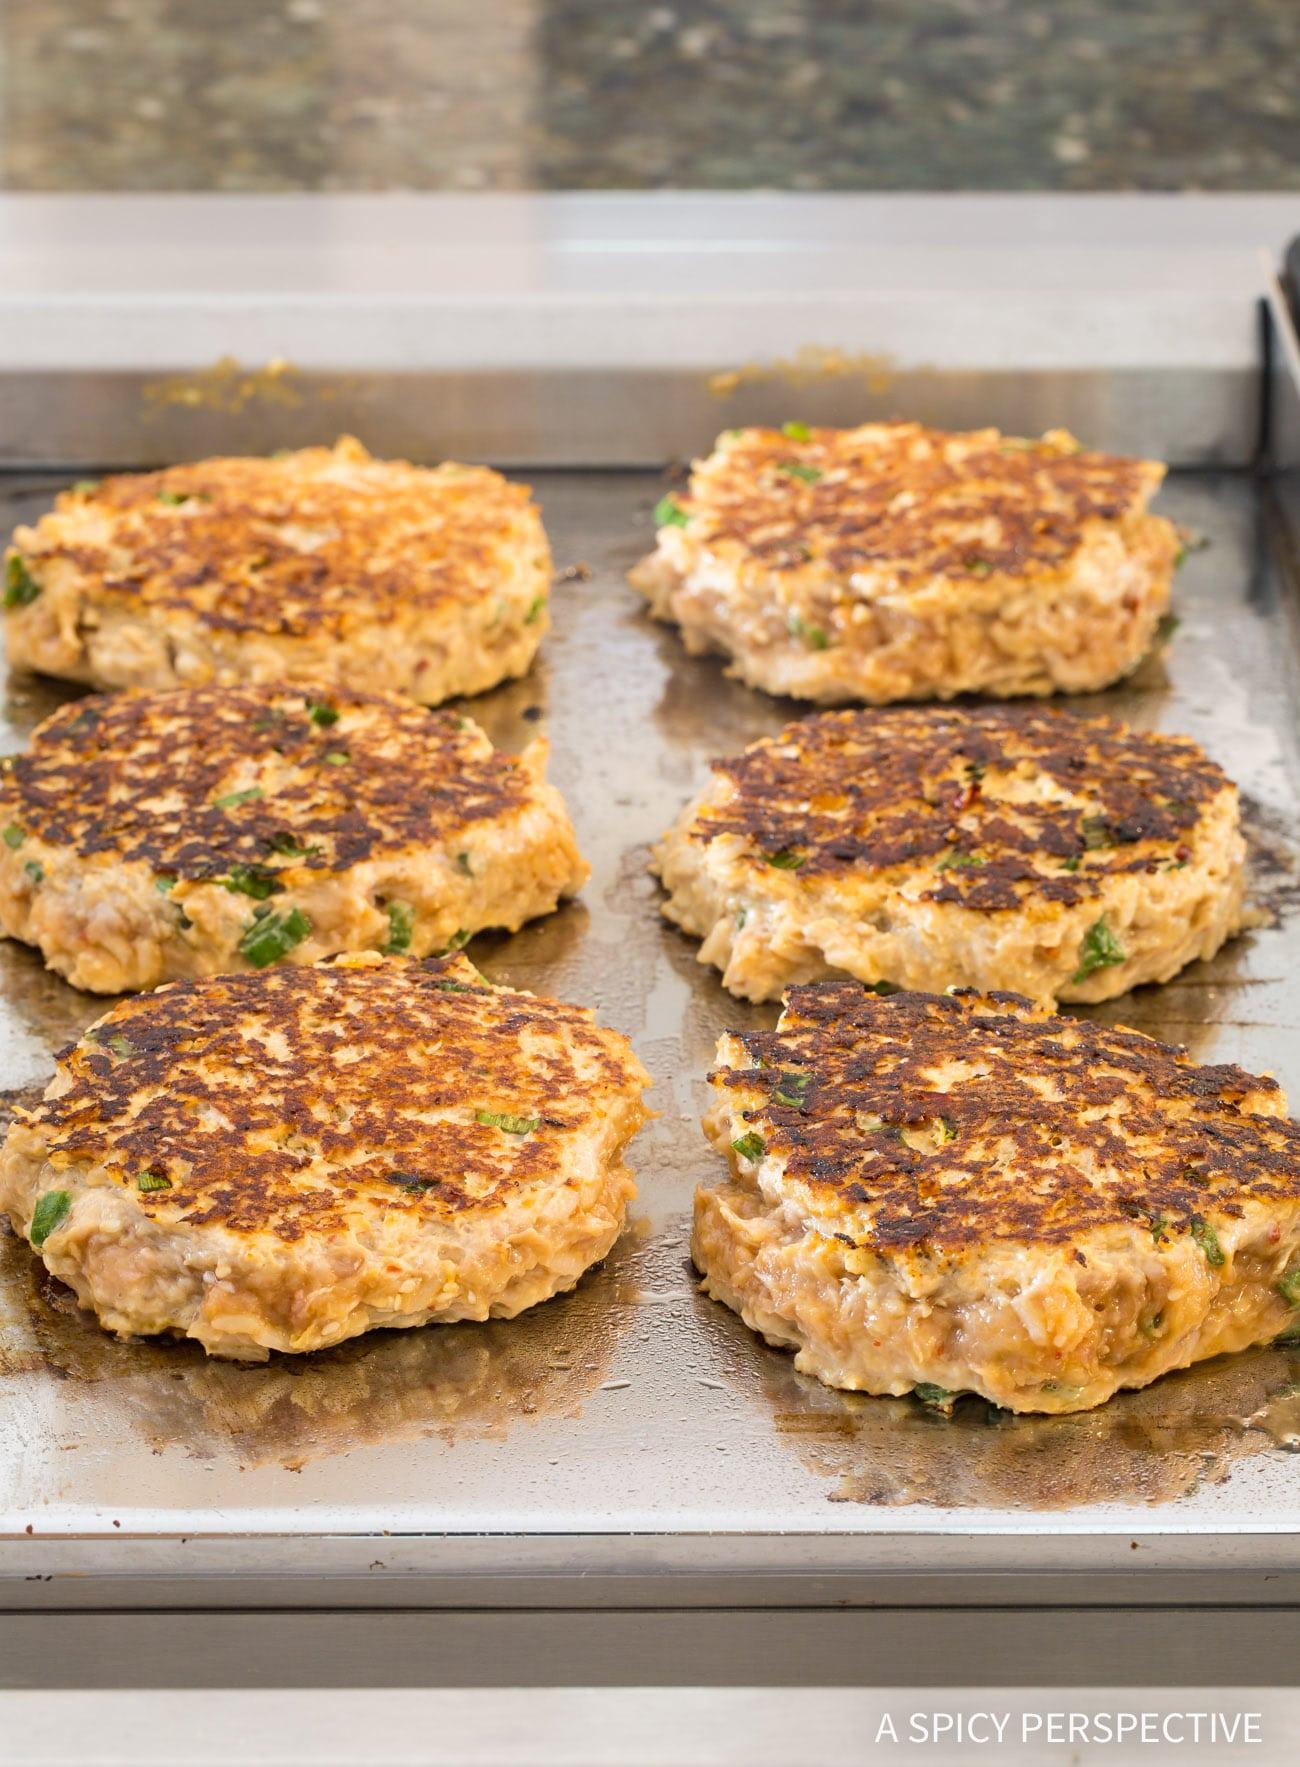 How To: Easy Sesame Chicken Burgers Recipe (Skinny Hamburgers)